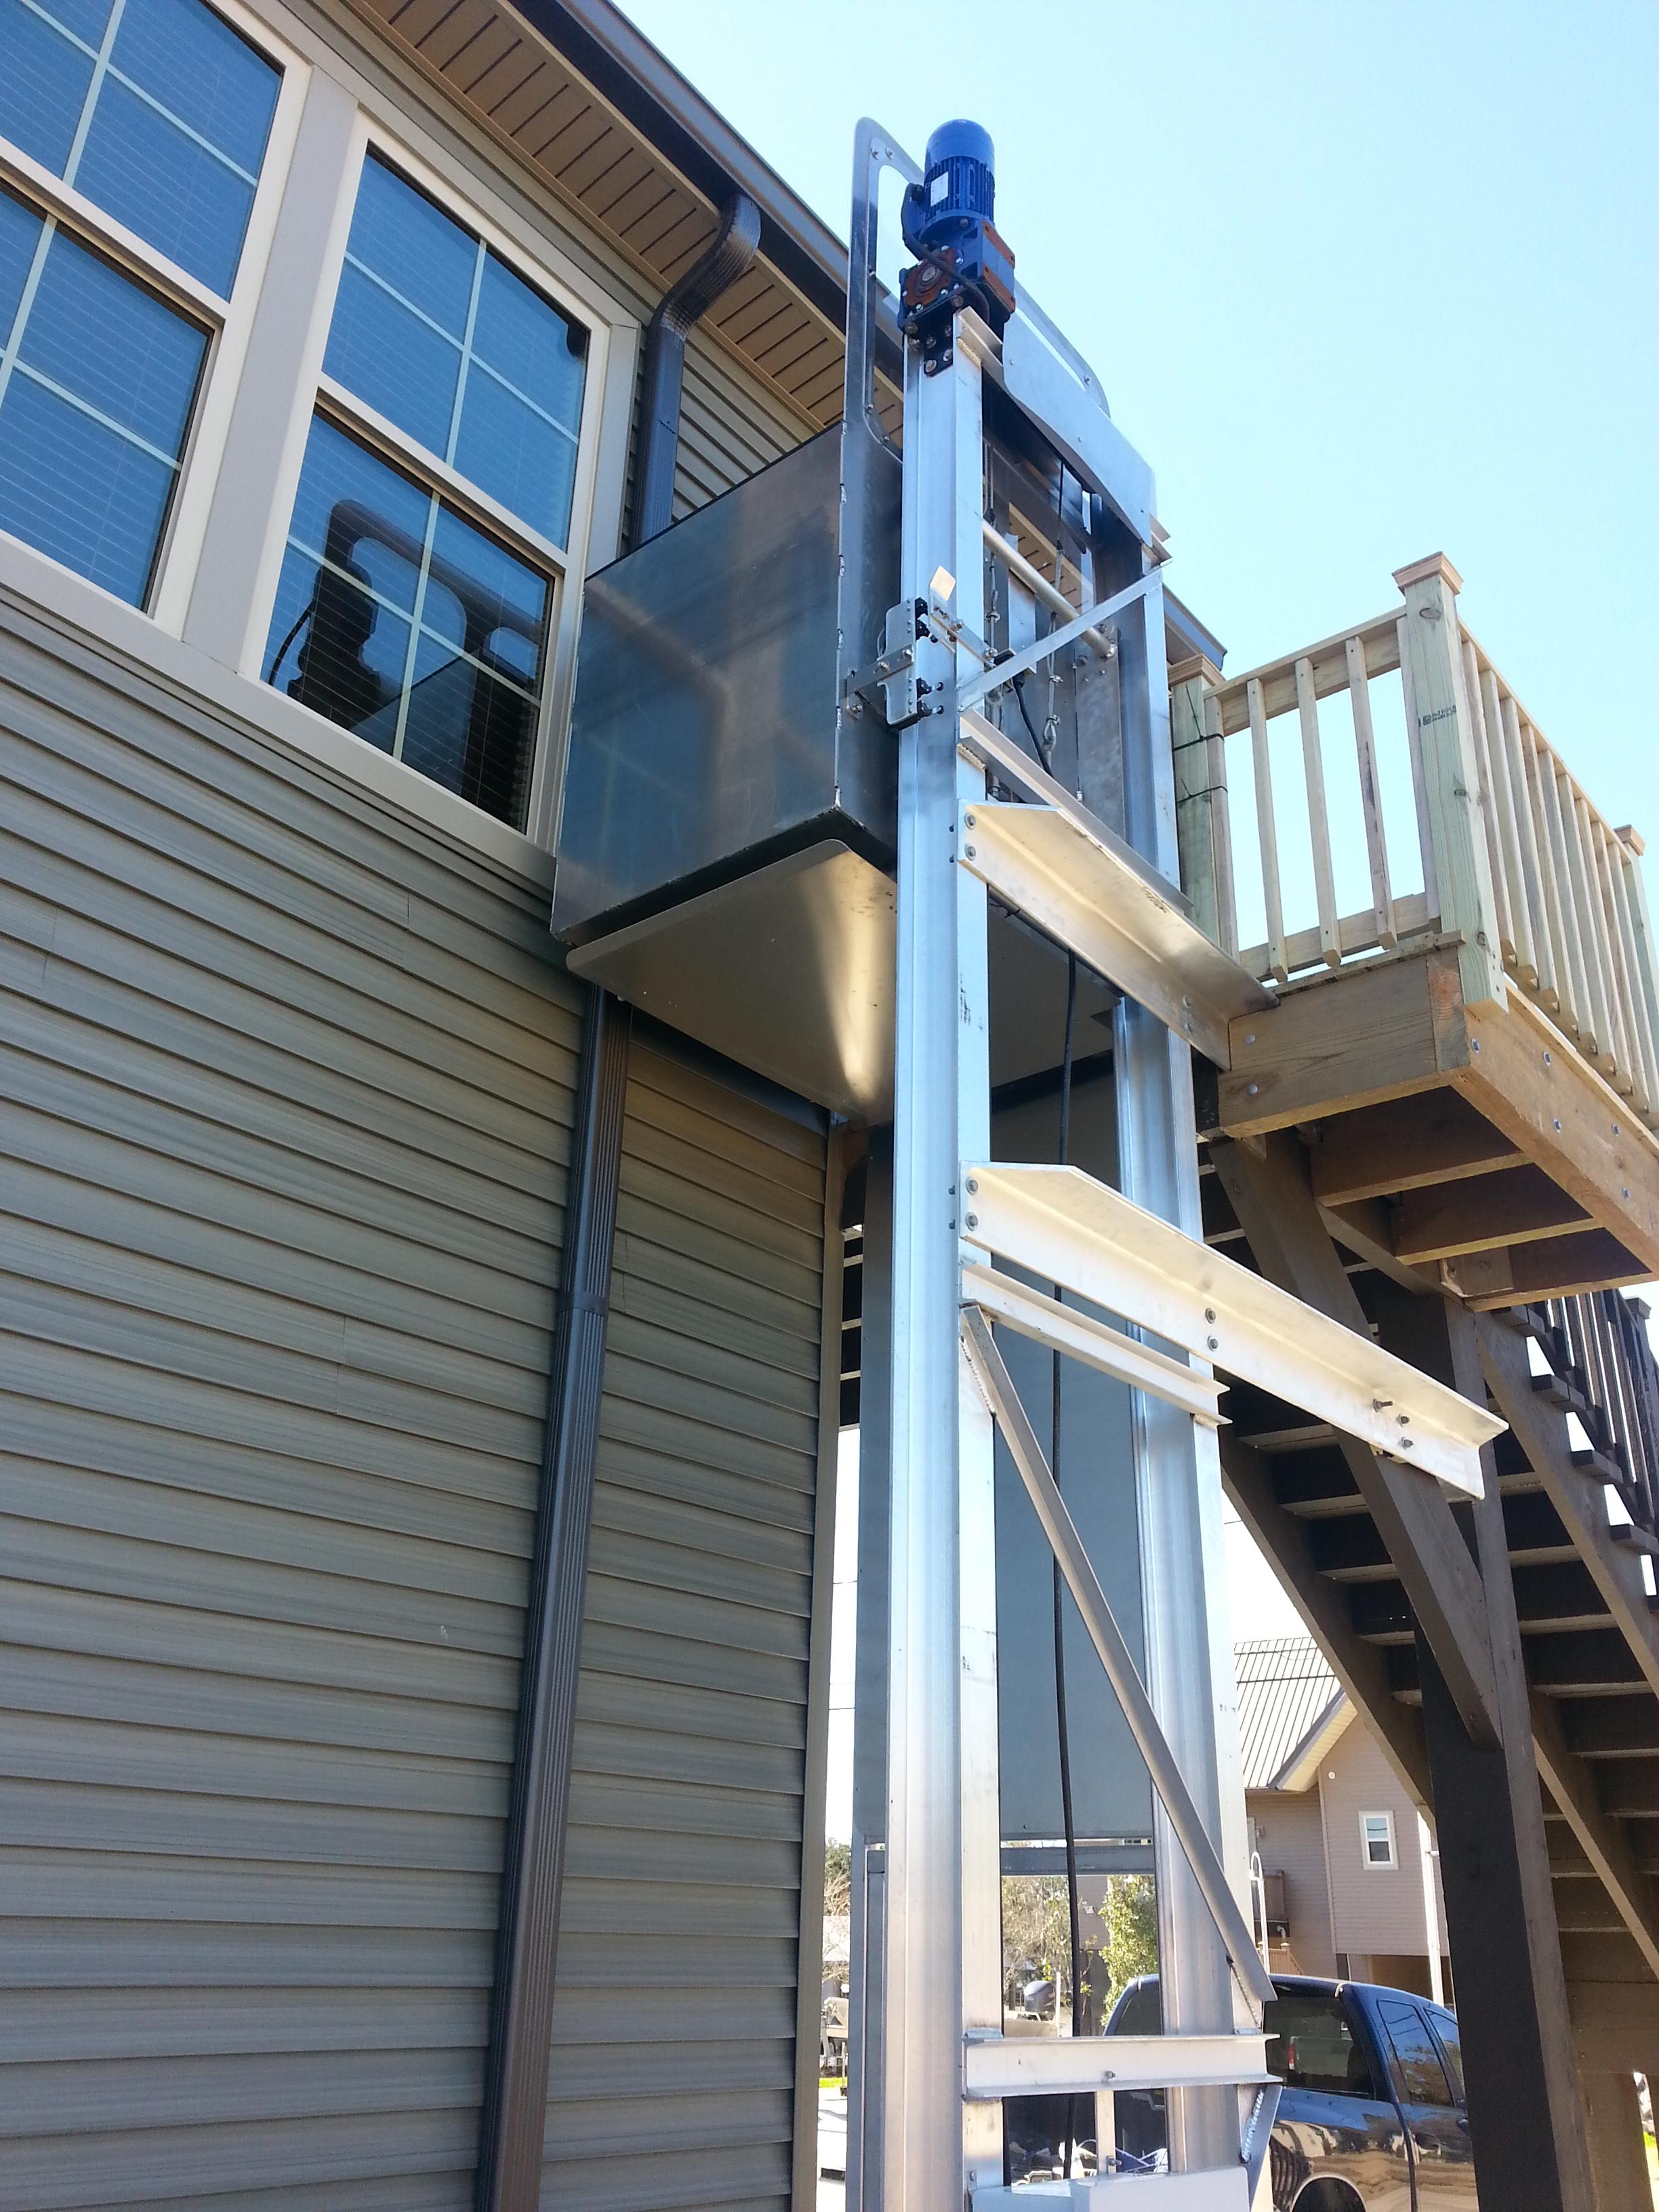 exterior-home-elevators-and-lifts-2014-01-16-11-51-44